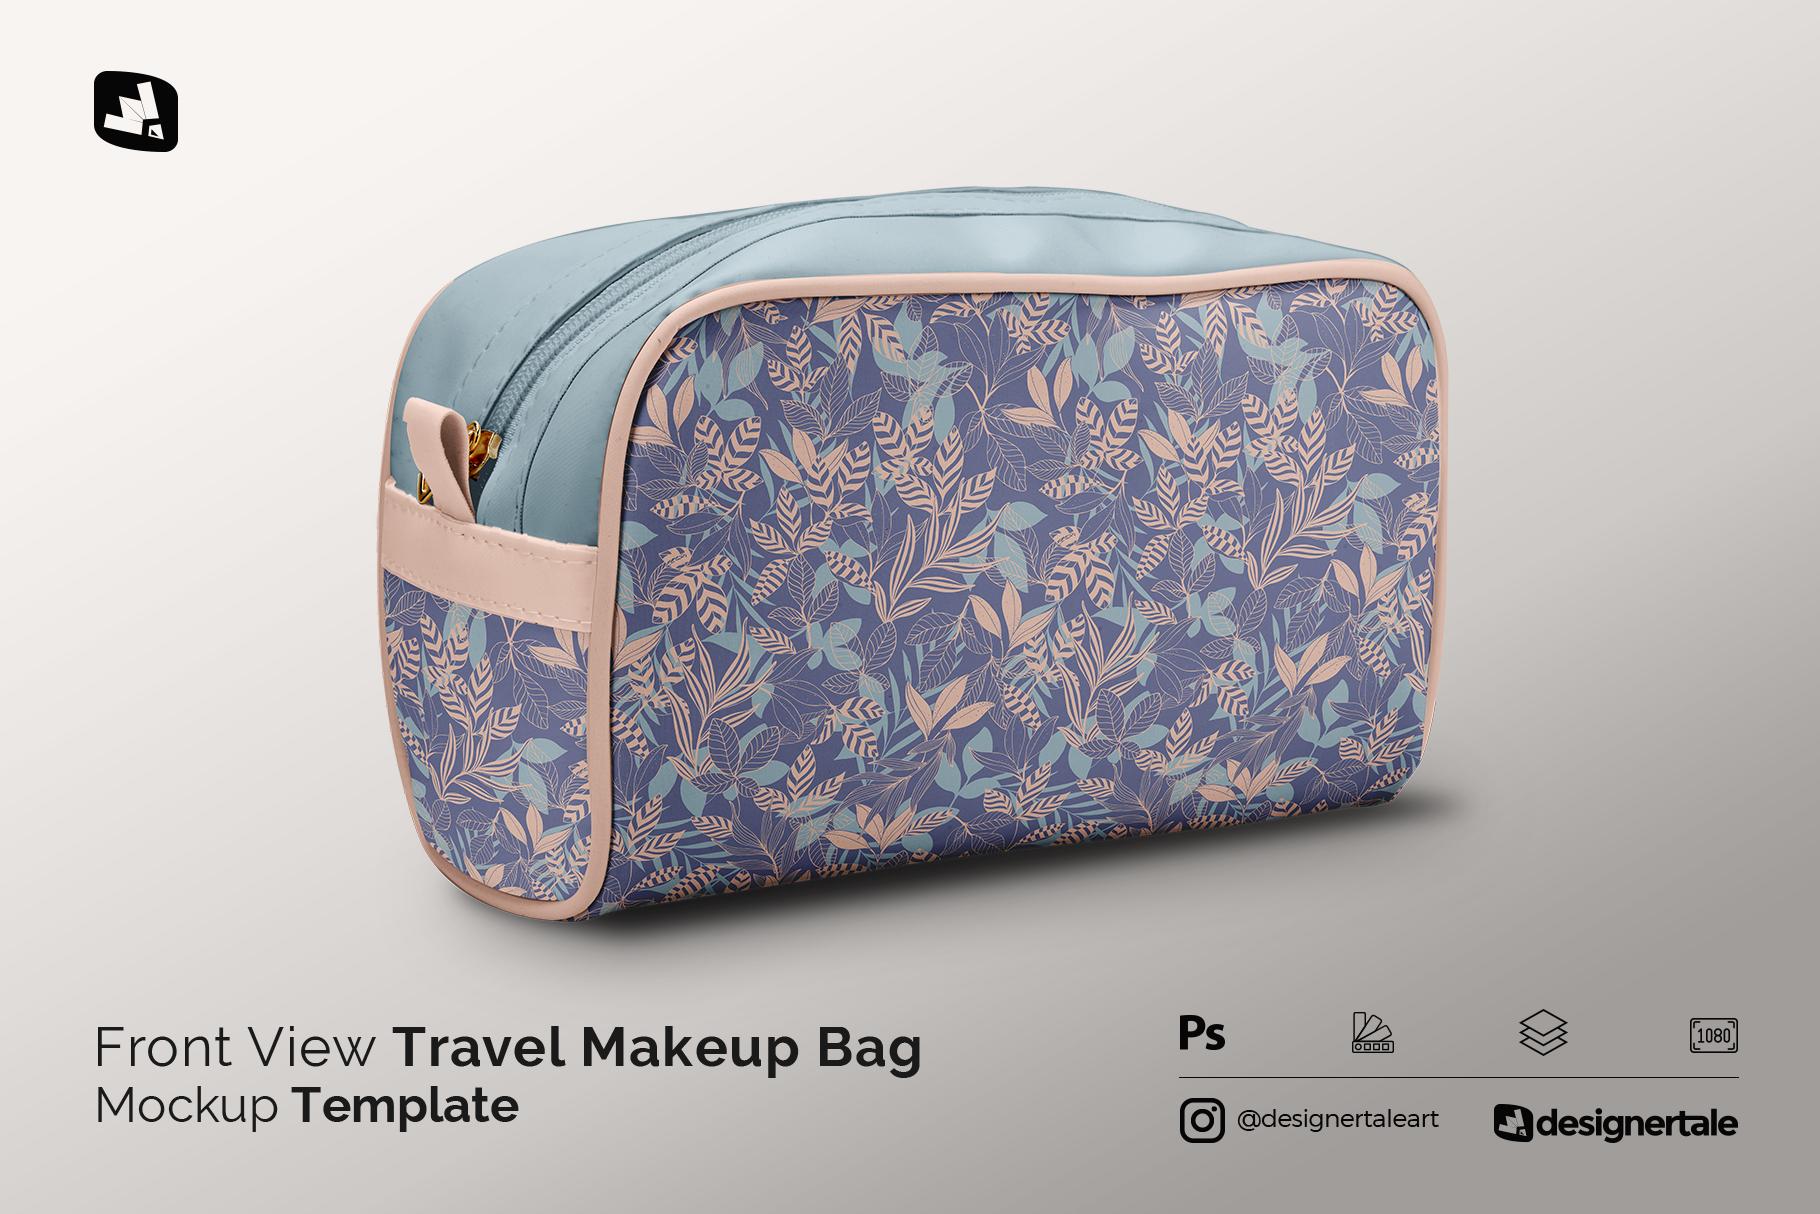 front view travel makeup bag mockup